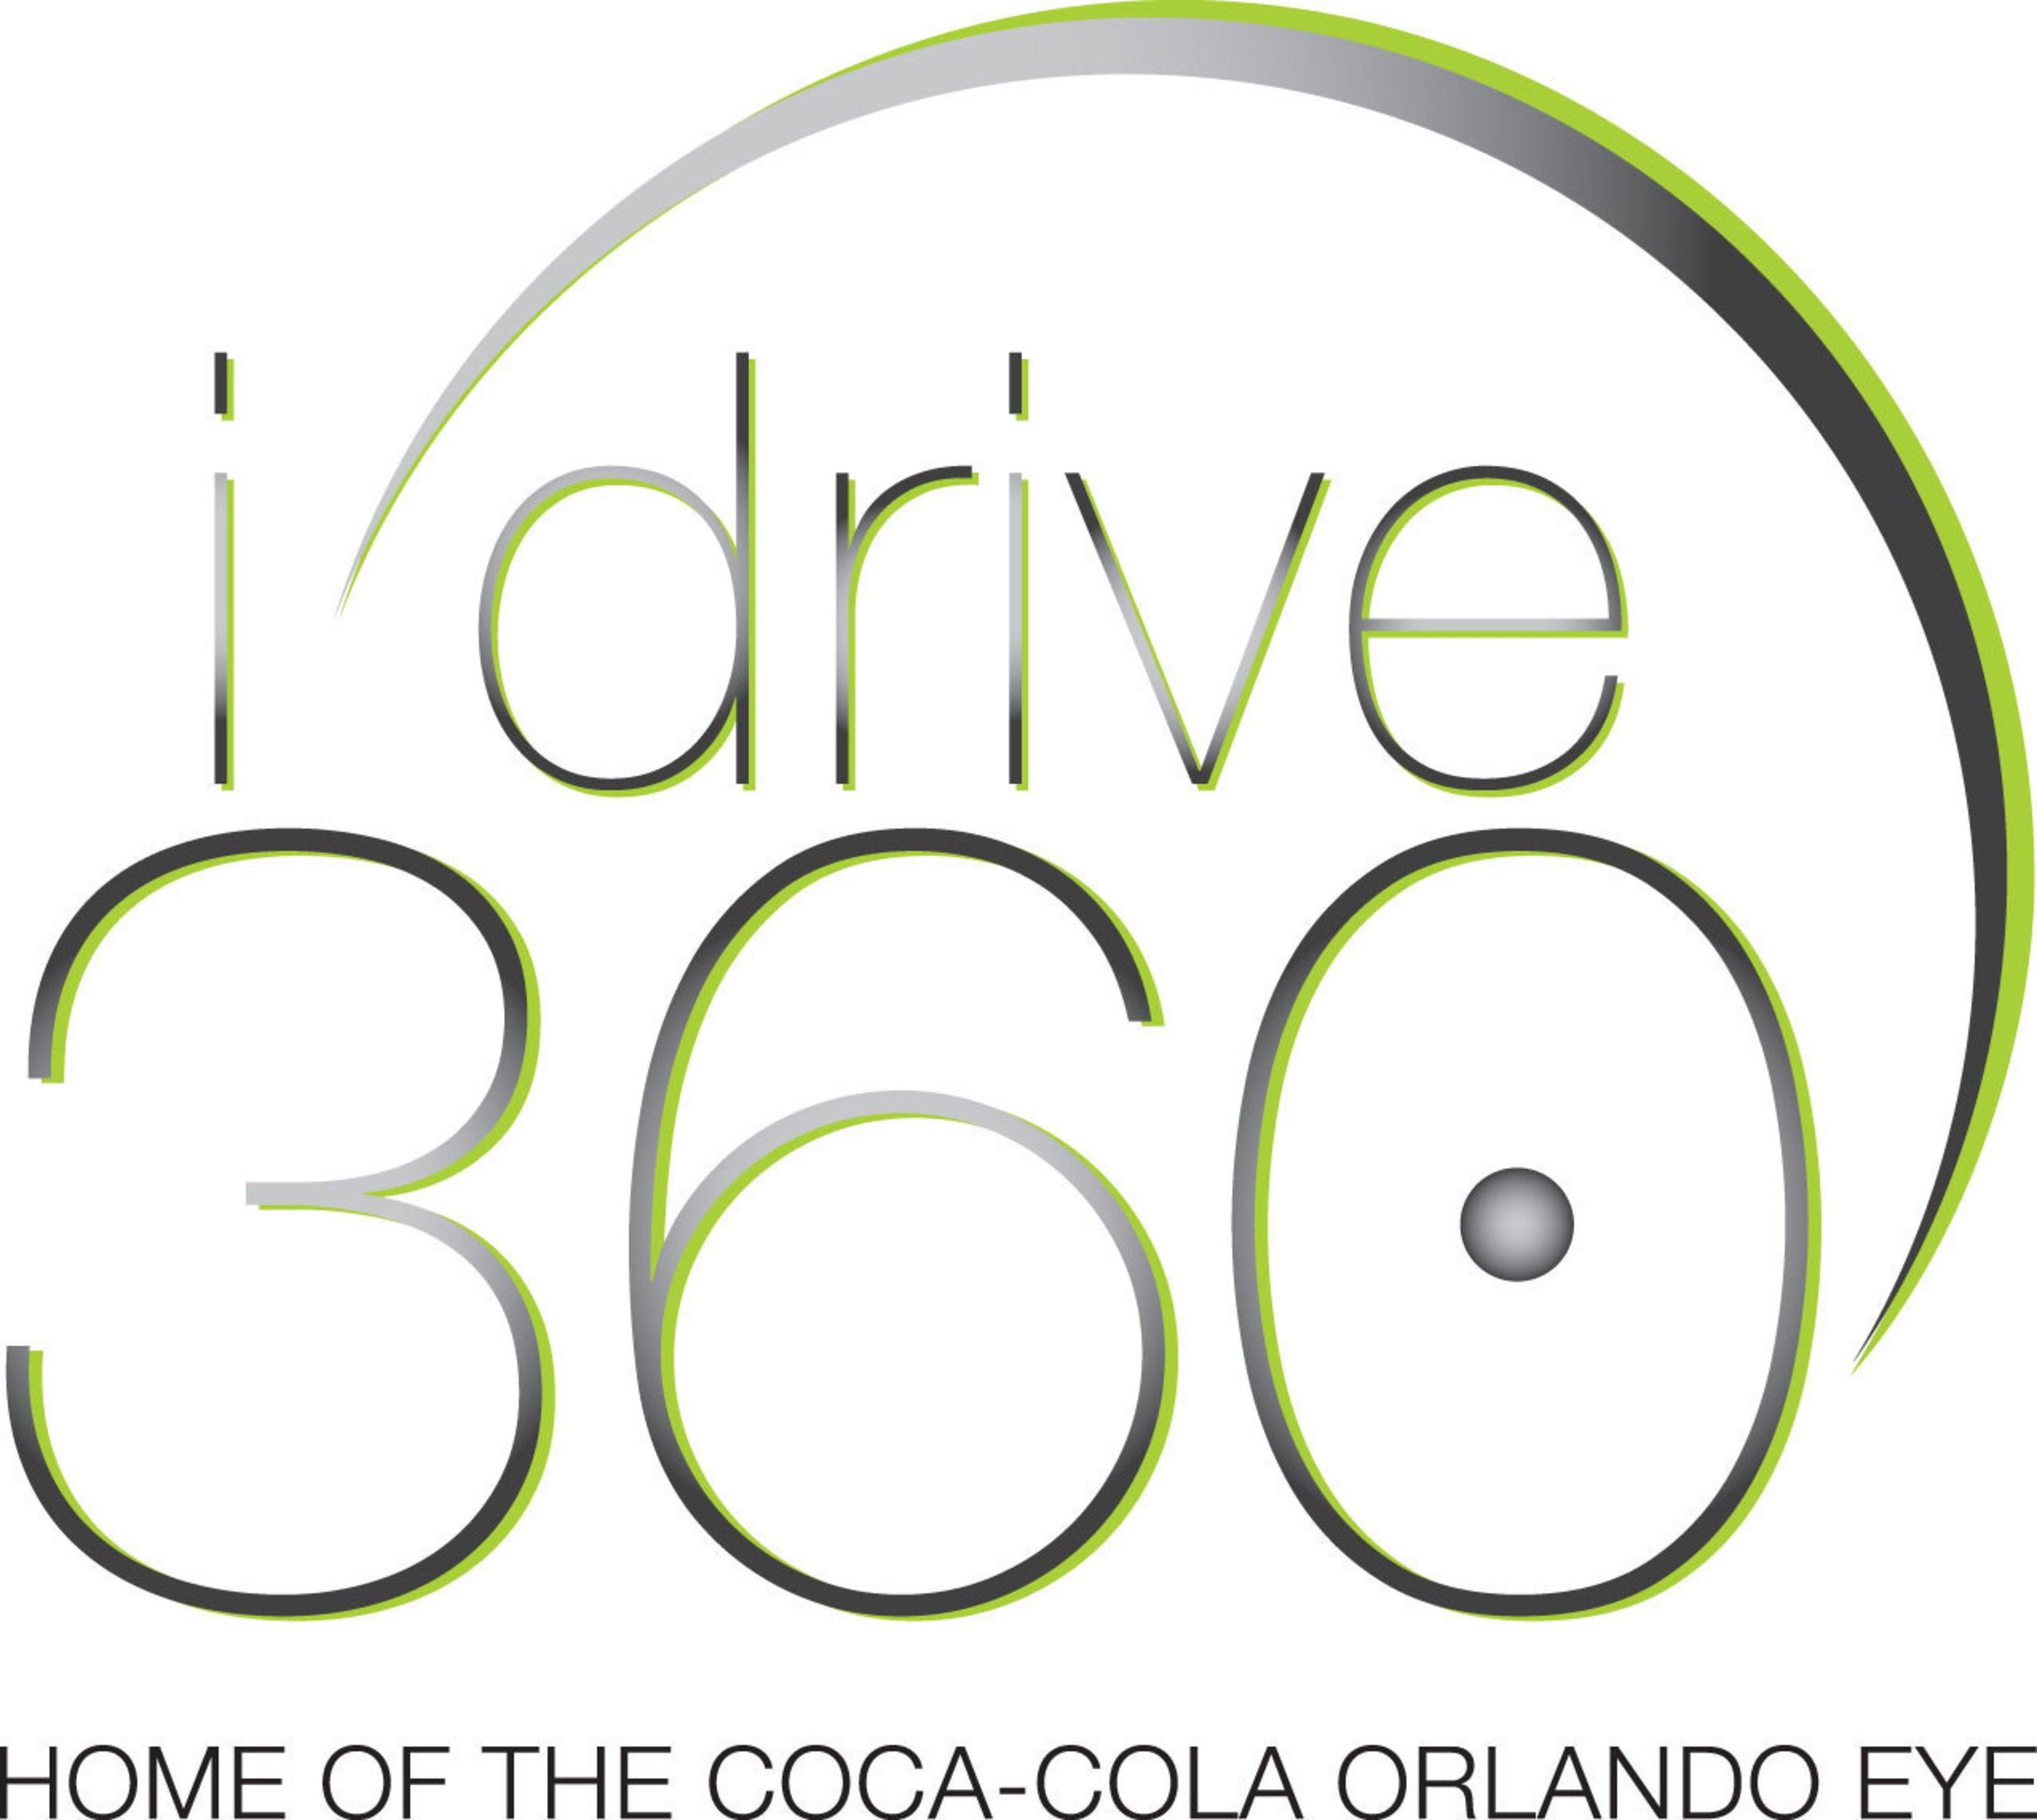 I-Drive 360 Home of the Coca-Cola Orlando Eye